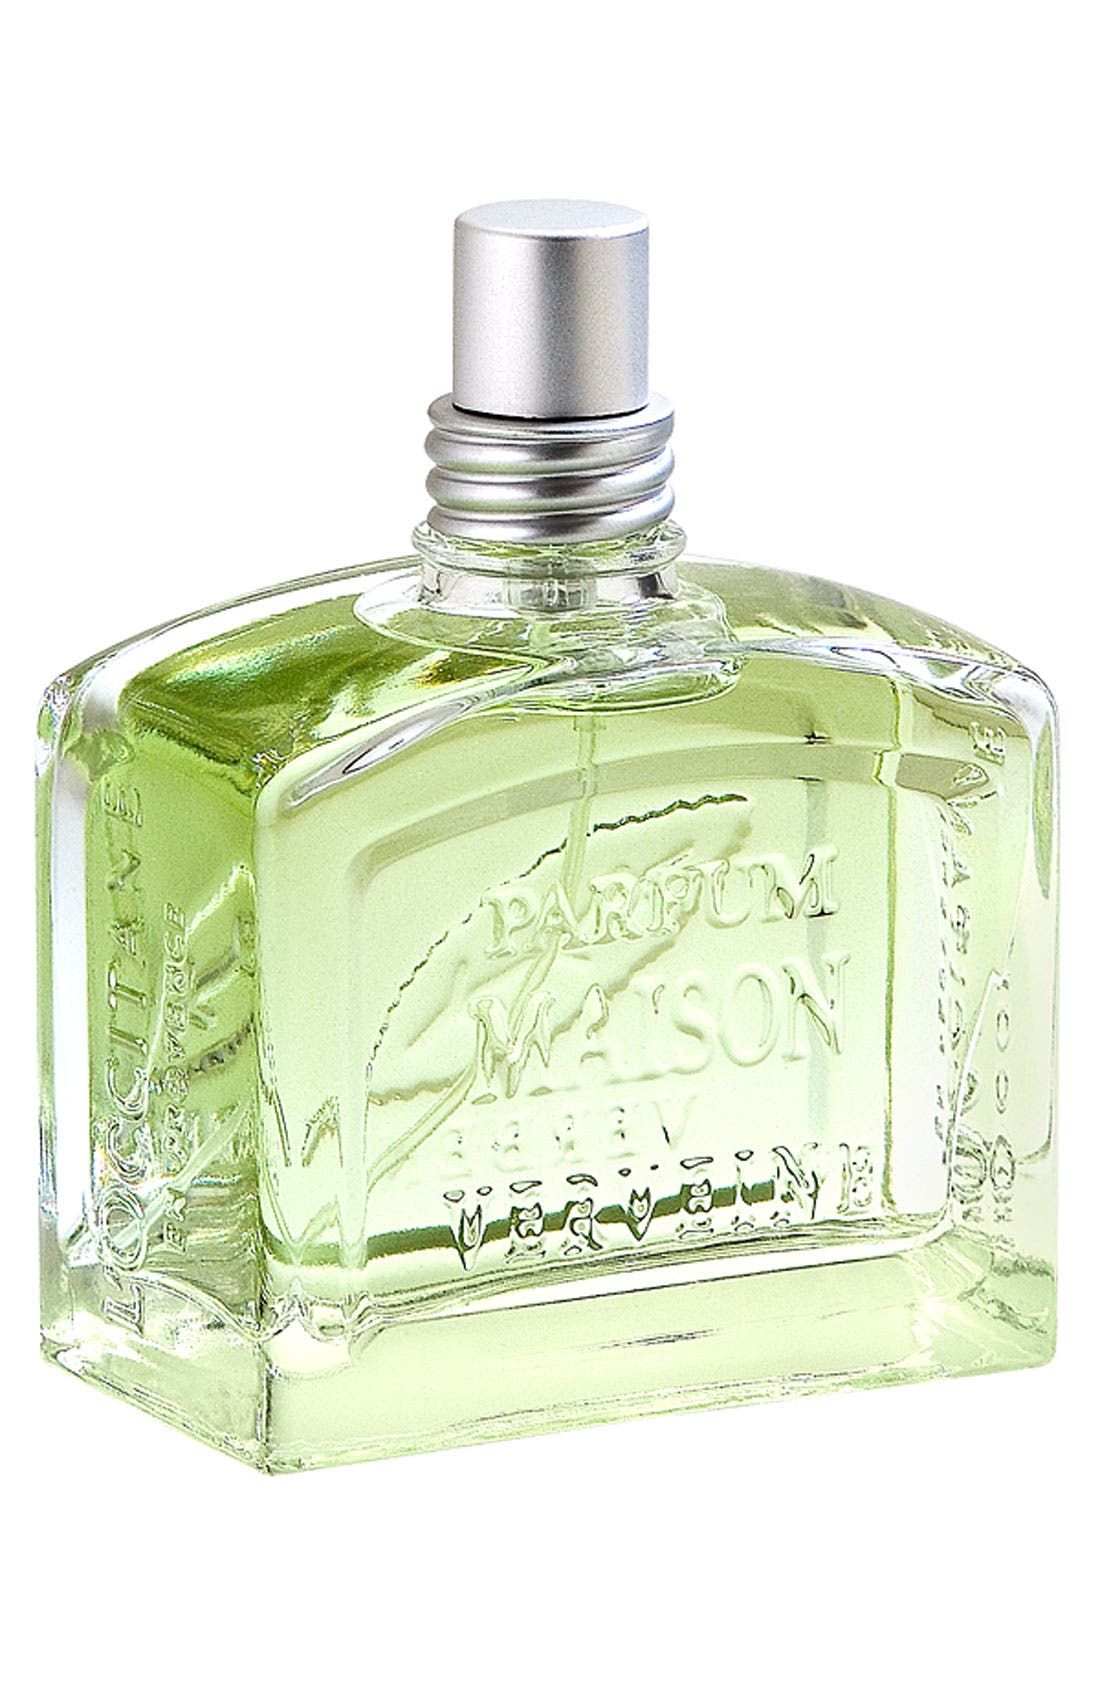 Main Image - L'Occitane Verbena Home Fragrance